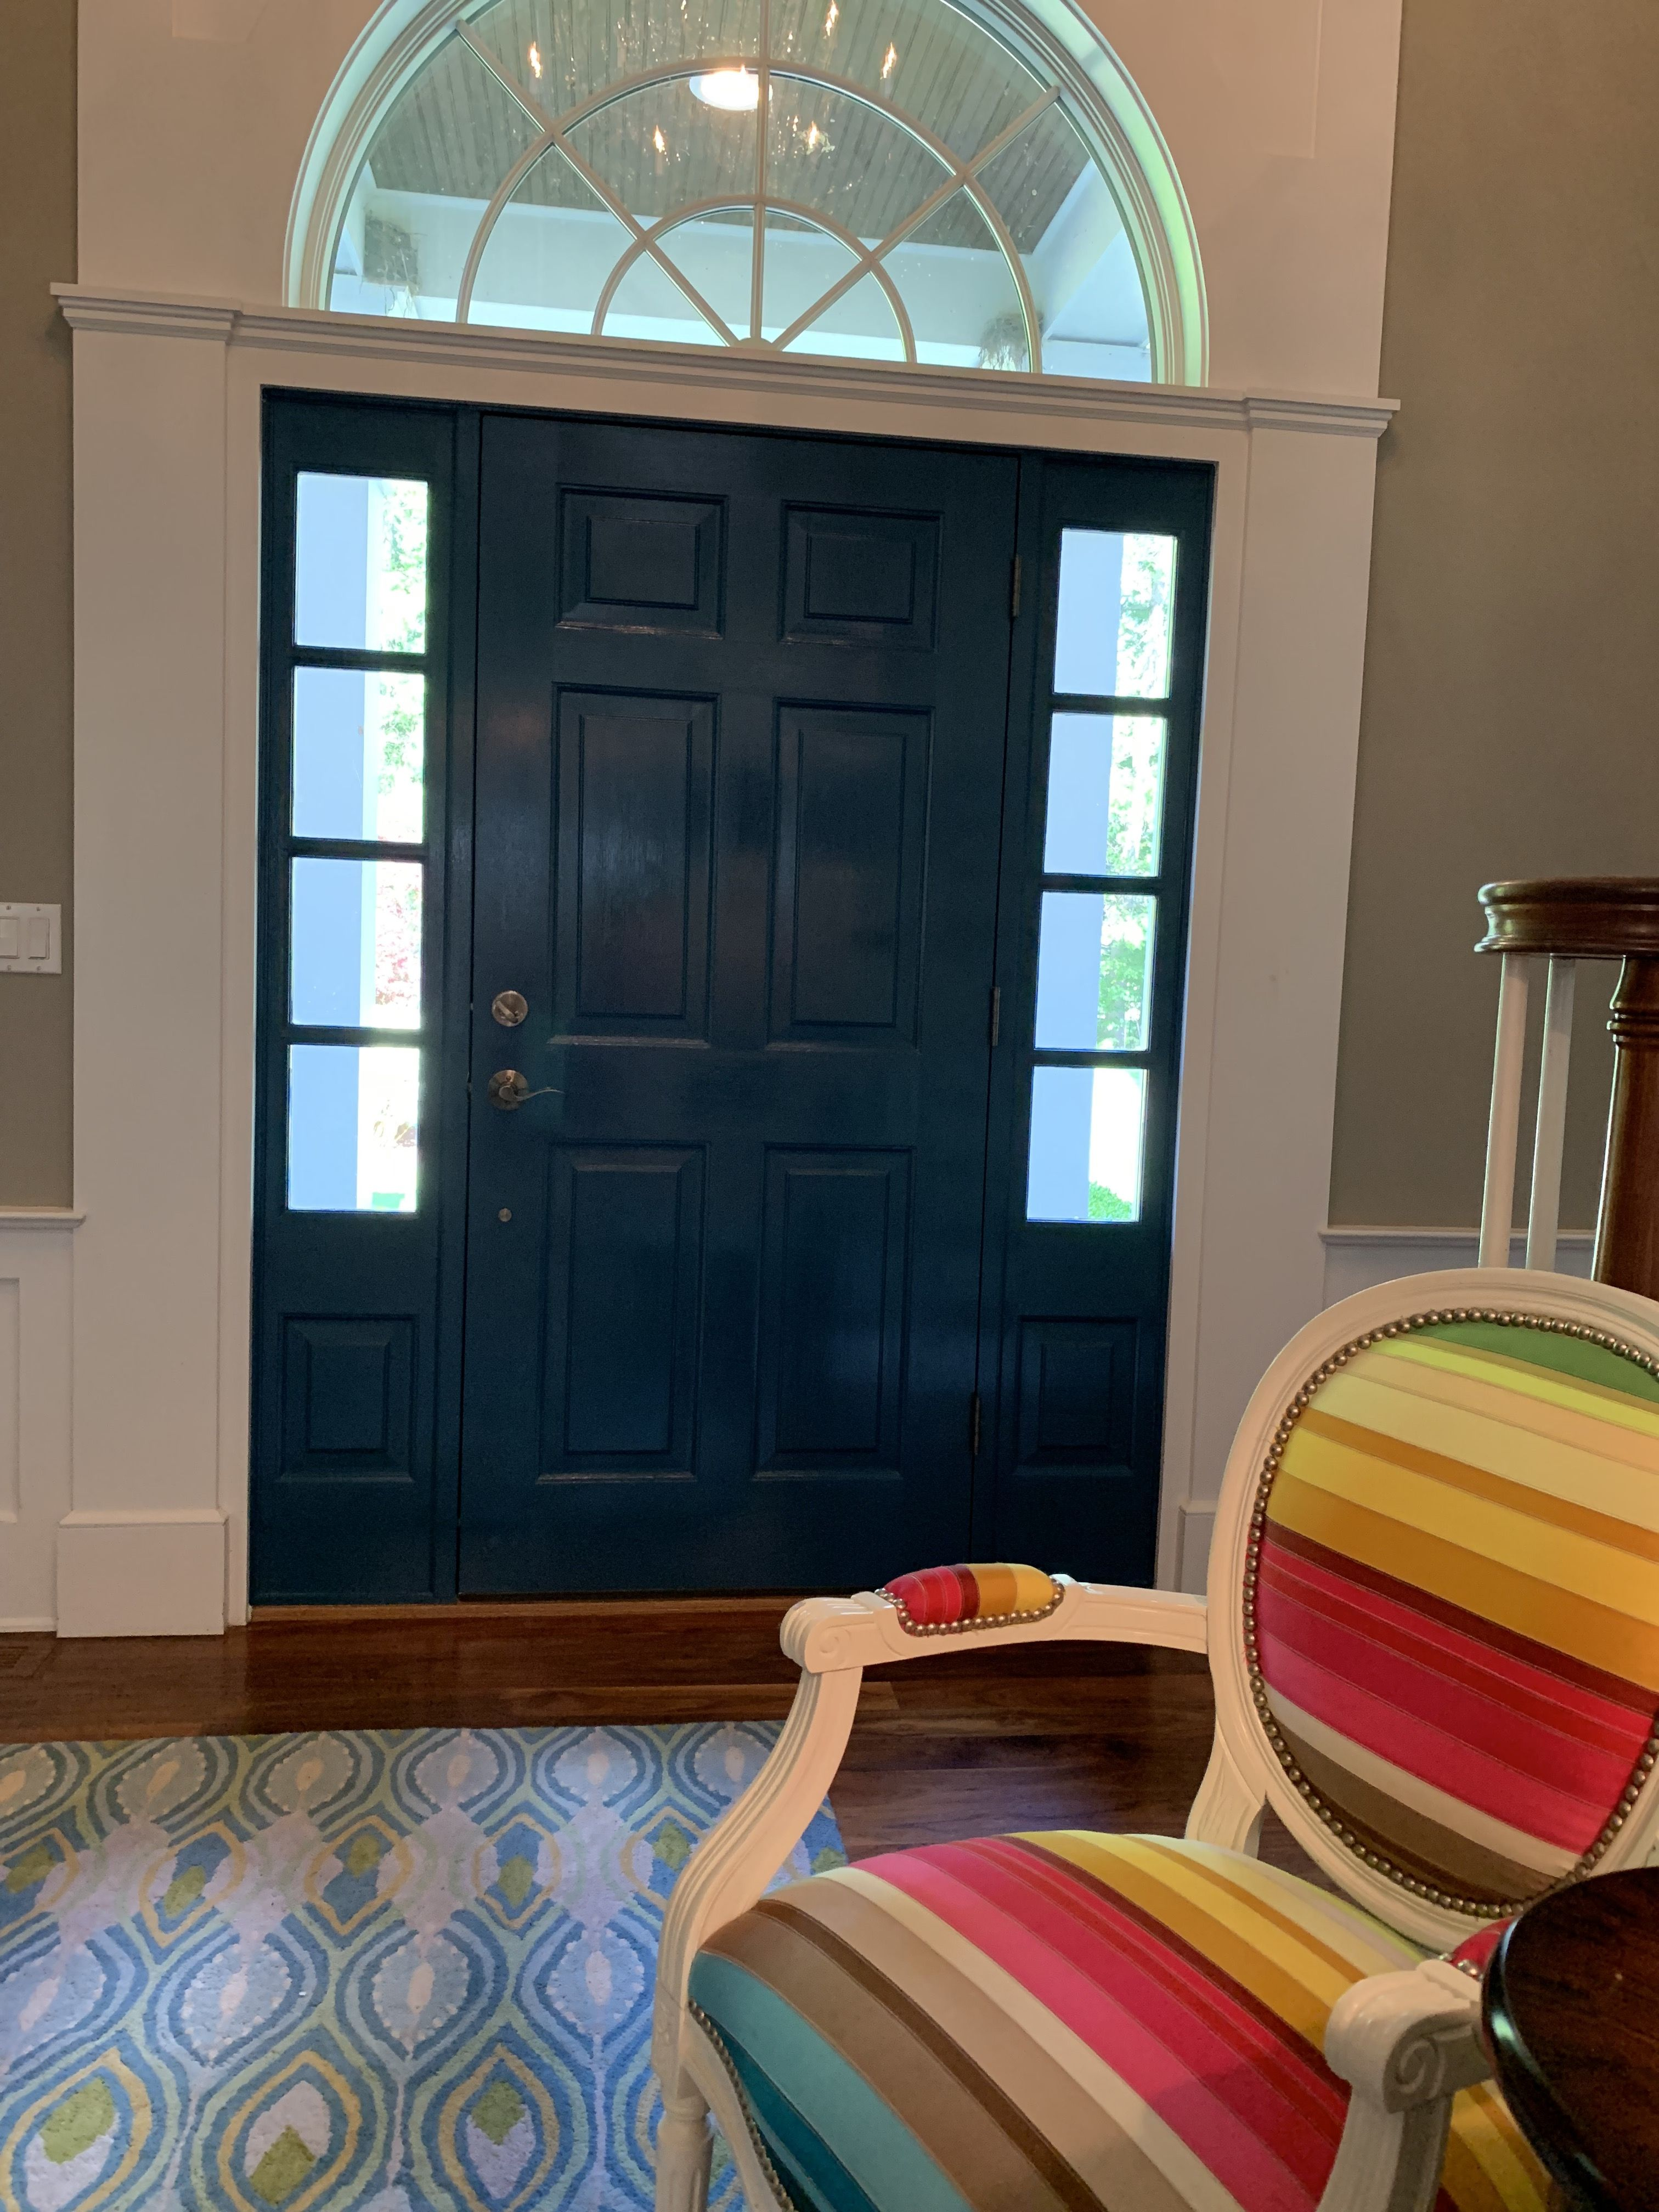 Painted Interior Door Door Painted Interior Doors Doors Interior Interior